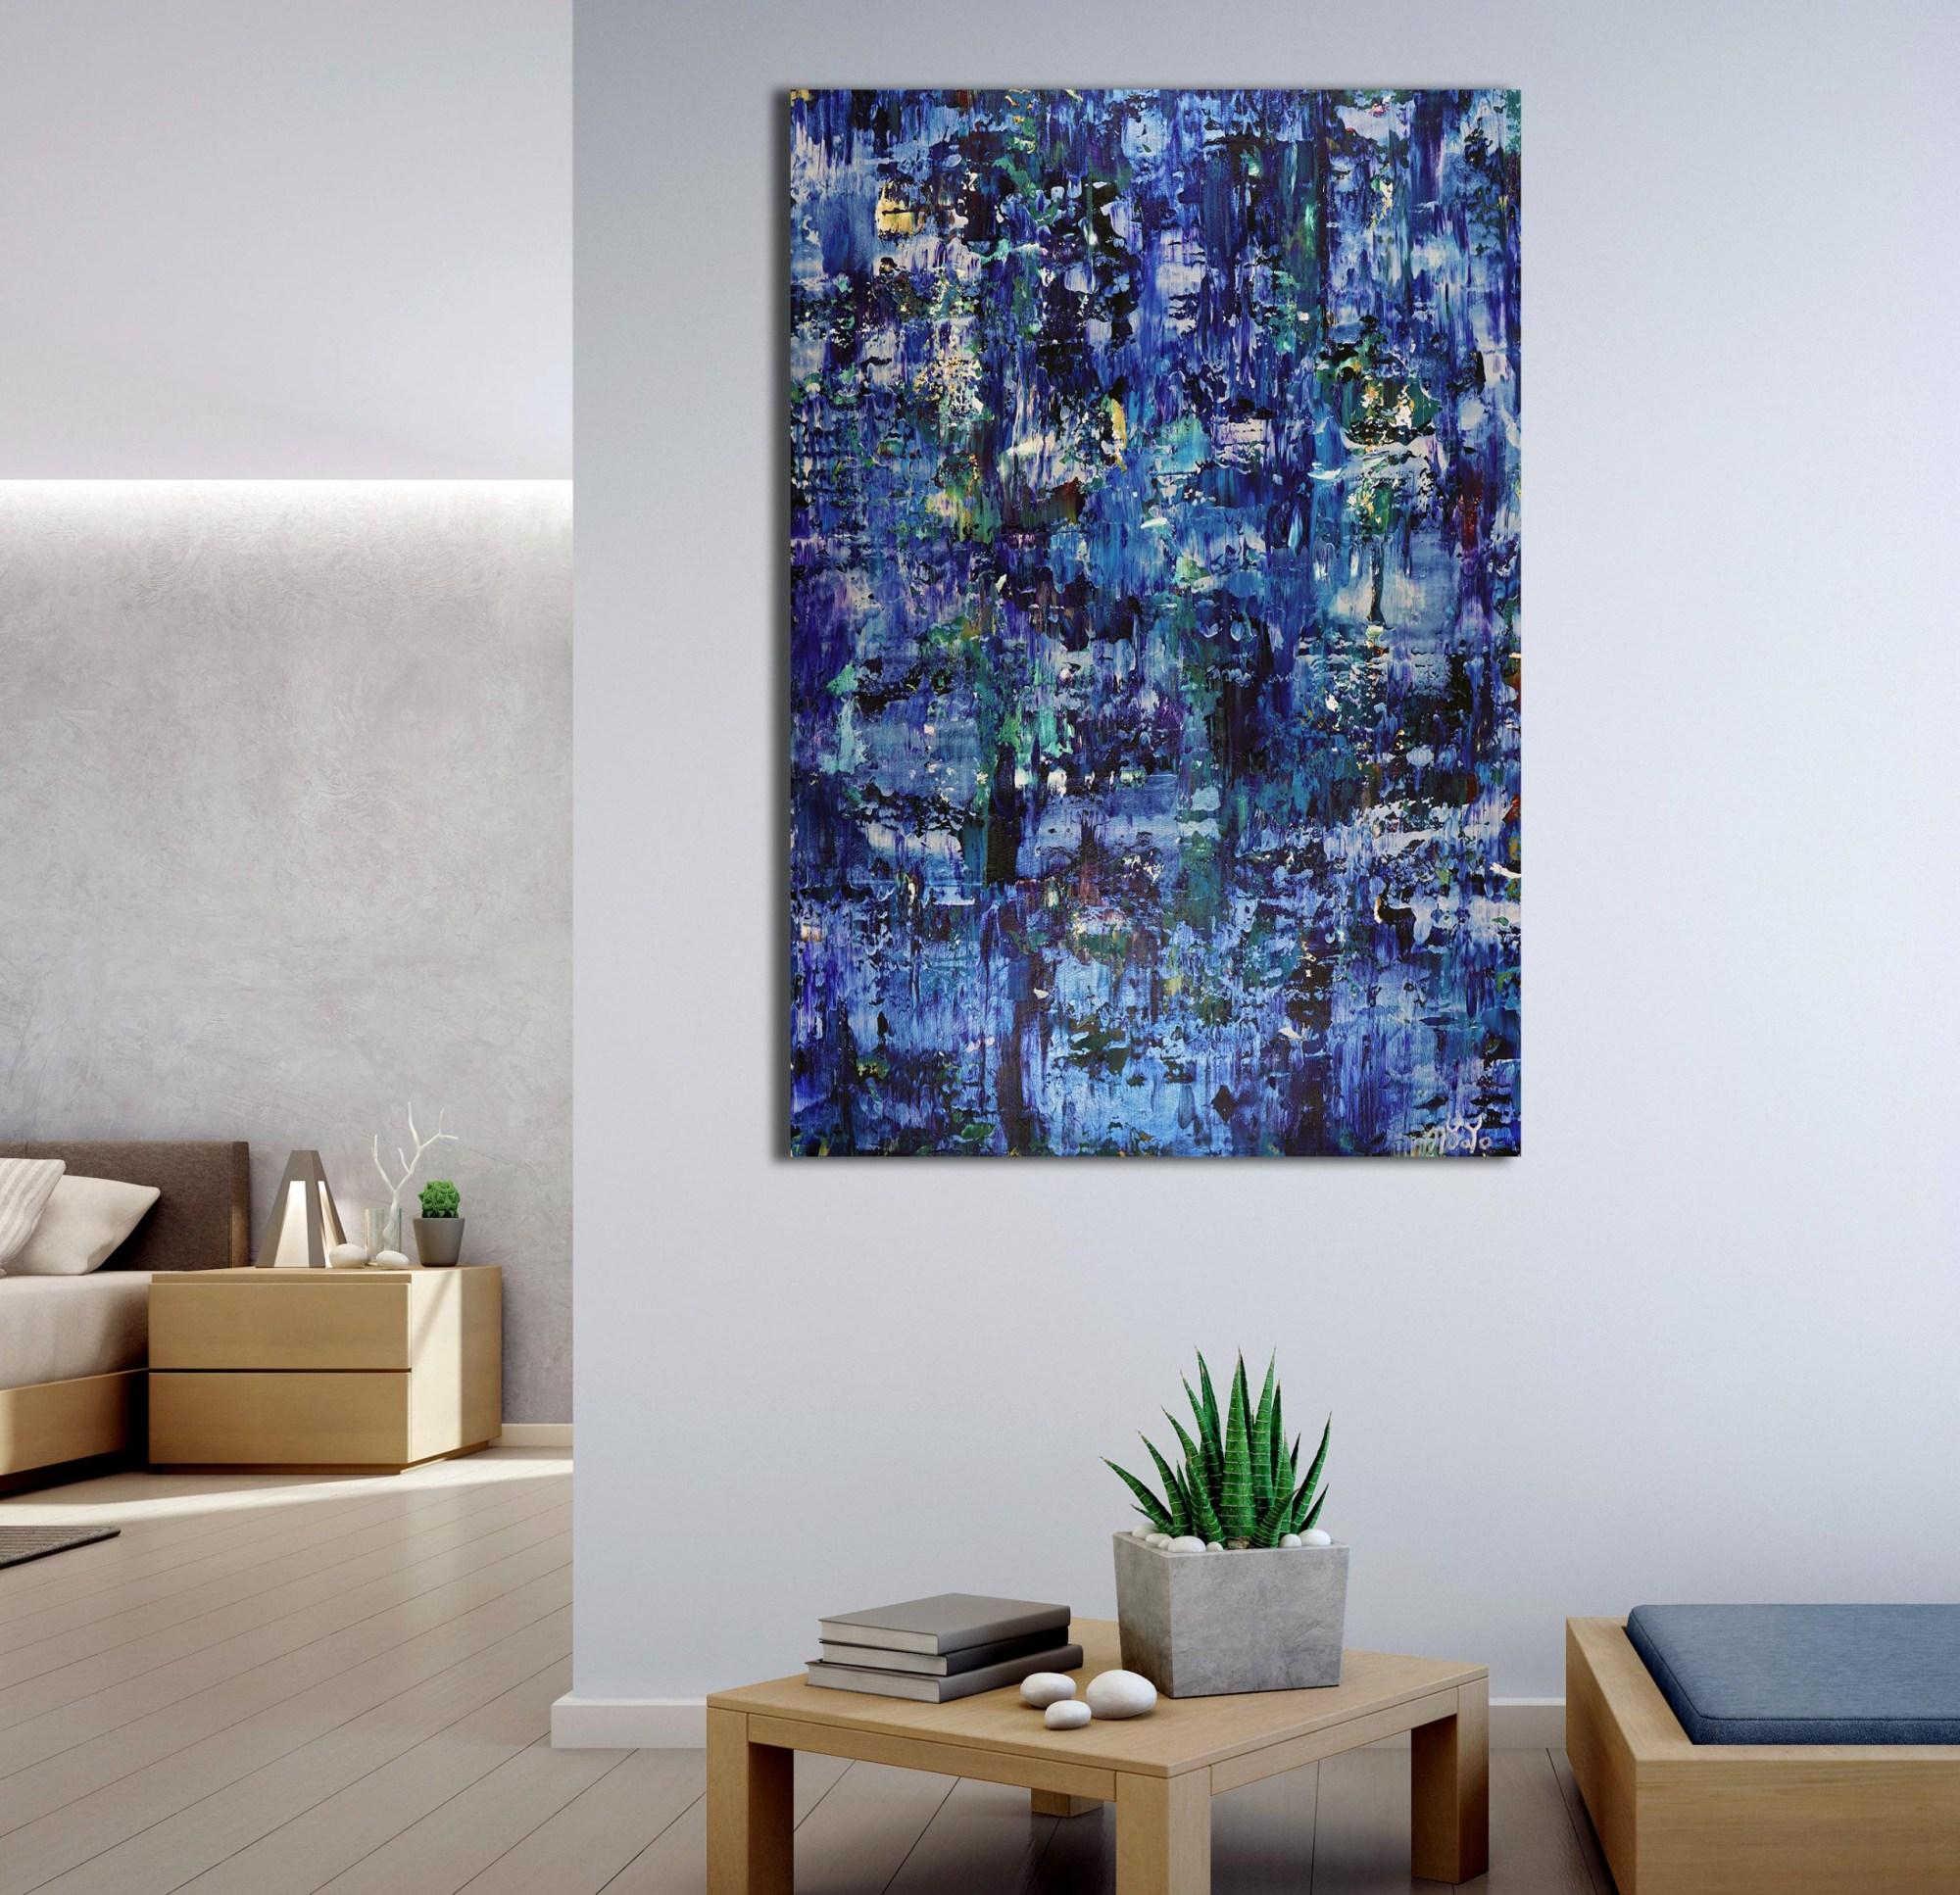 SOLD - Iridescent Midnight Blue (2021) by Nestor Toro